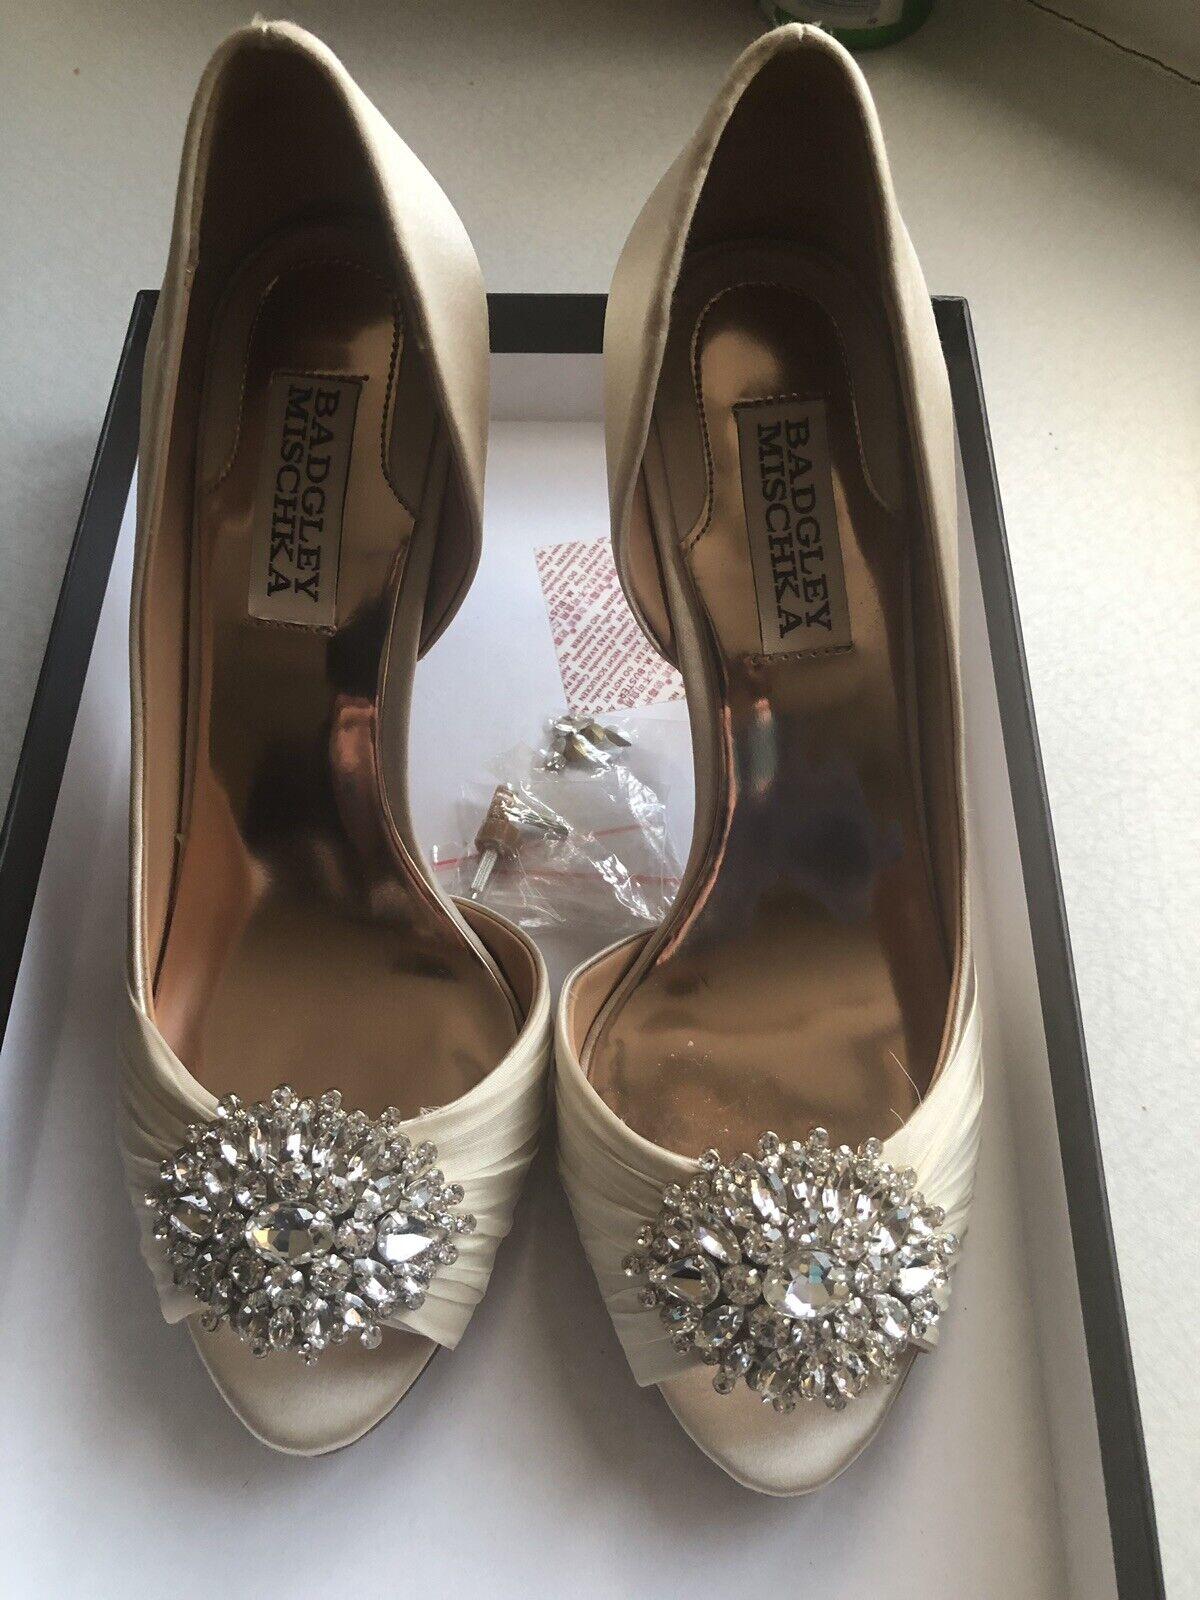 Badgley mischka Wedding shoes Size 4 4 4 587a6c